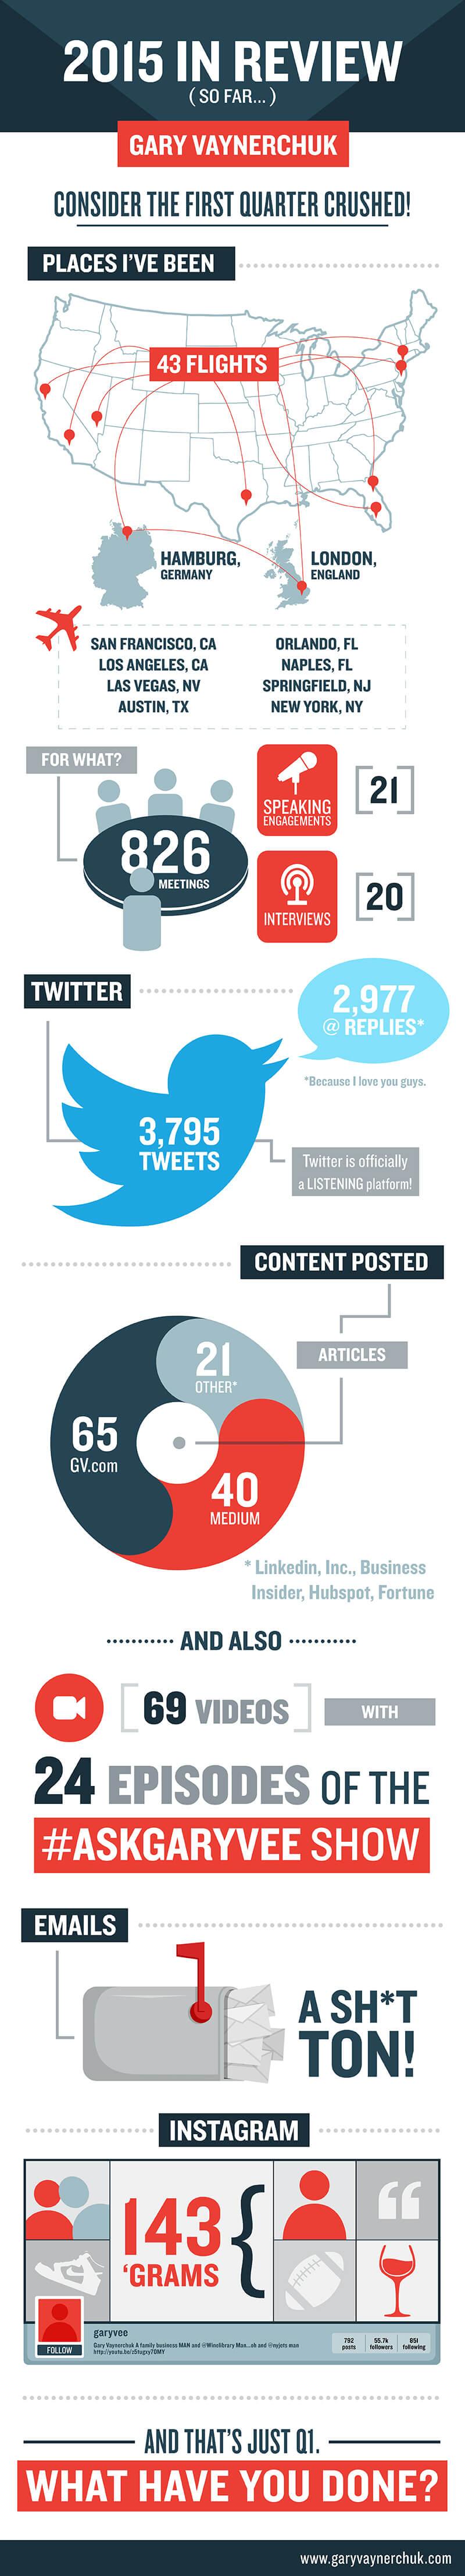 garyvee2015-infographic